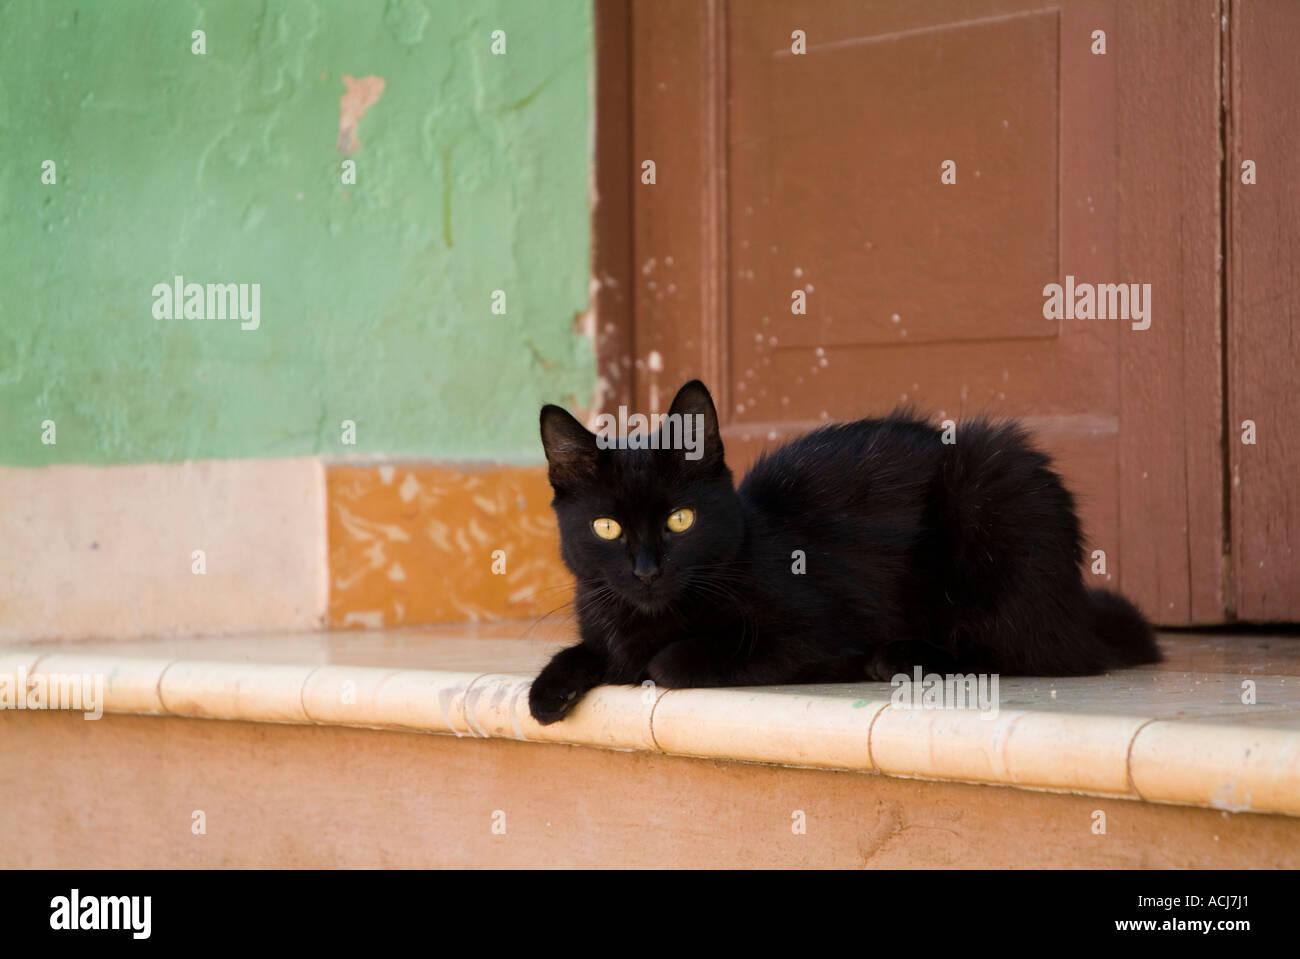 Black cat lying on a doorstep in Trinidad, Cuba. - Stock Image